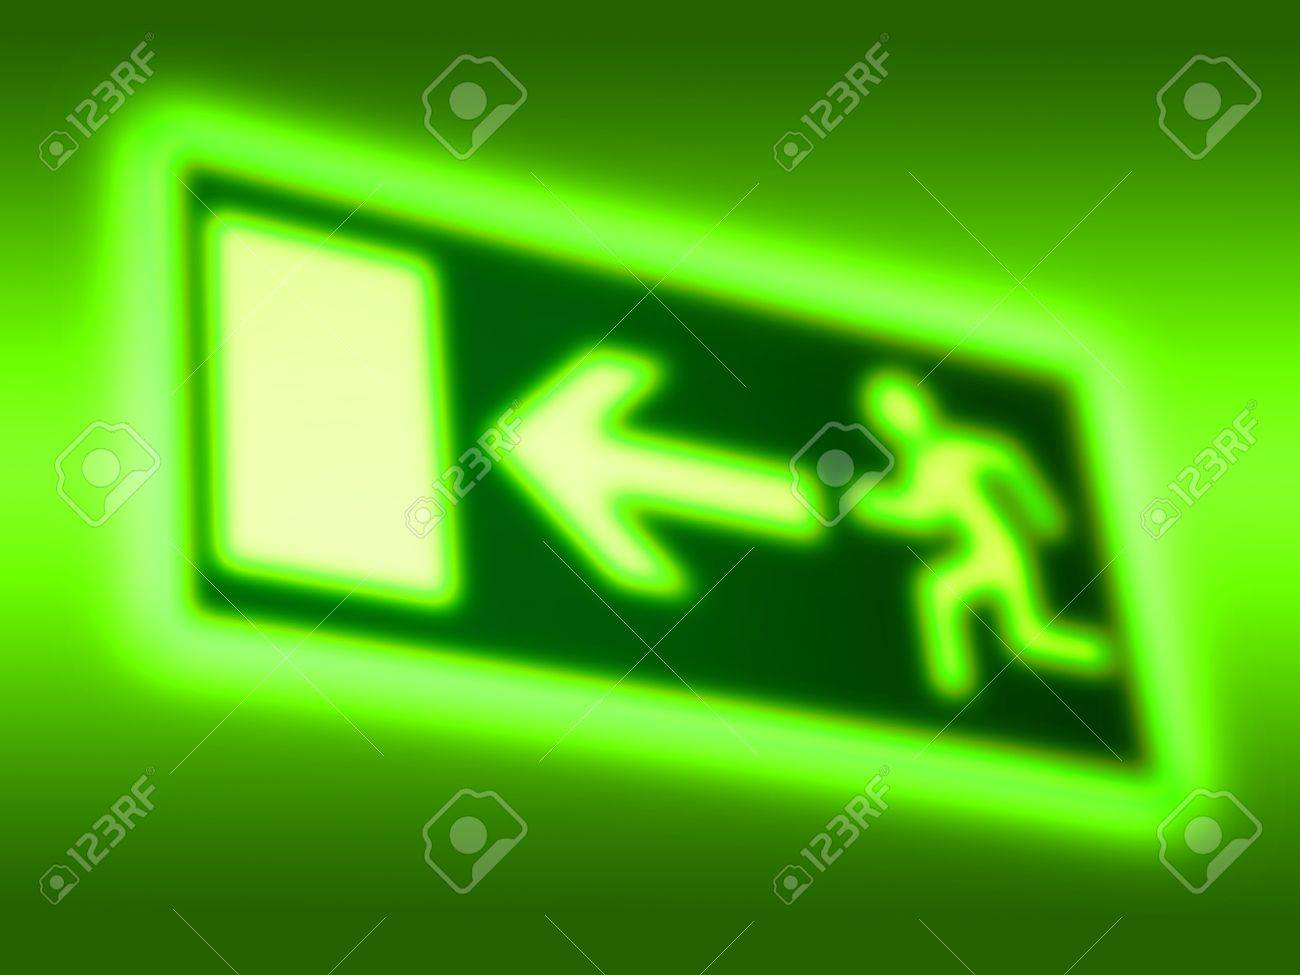 Emergency exit symbol background - 17099435